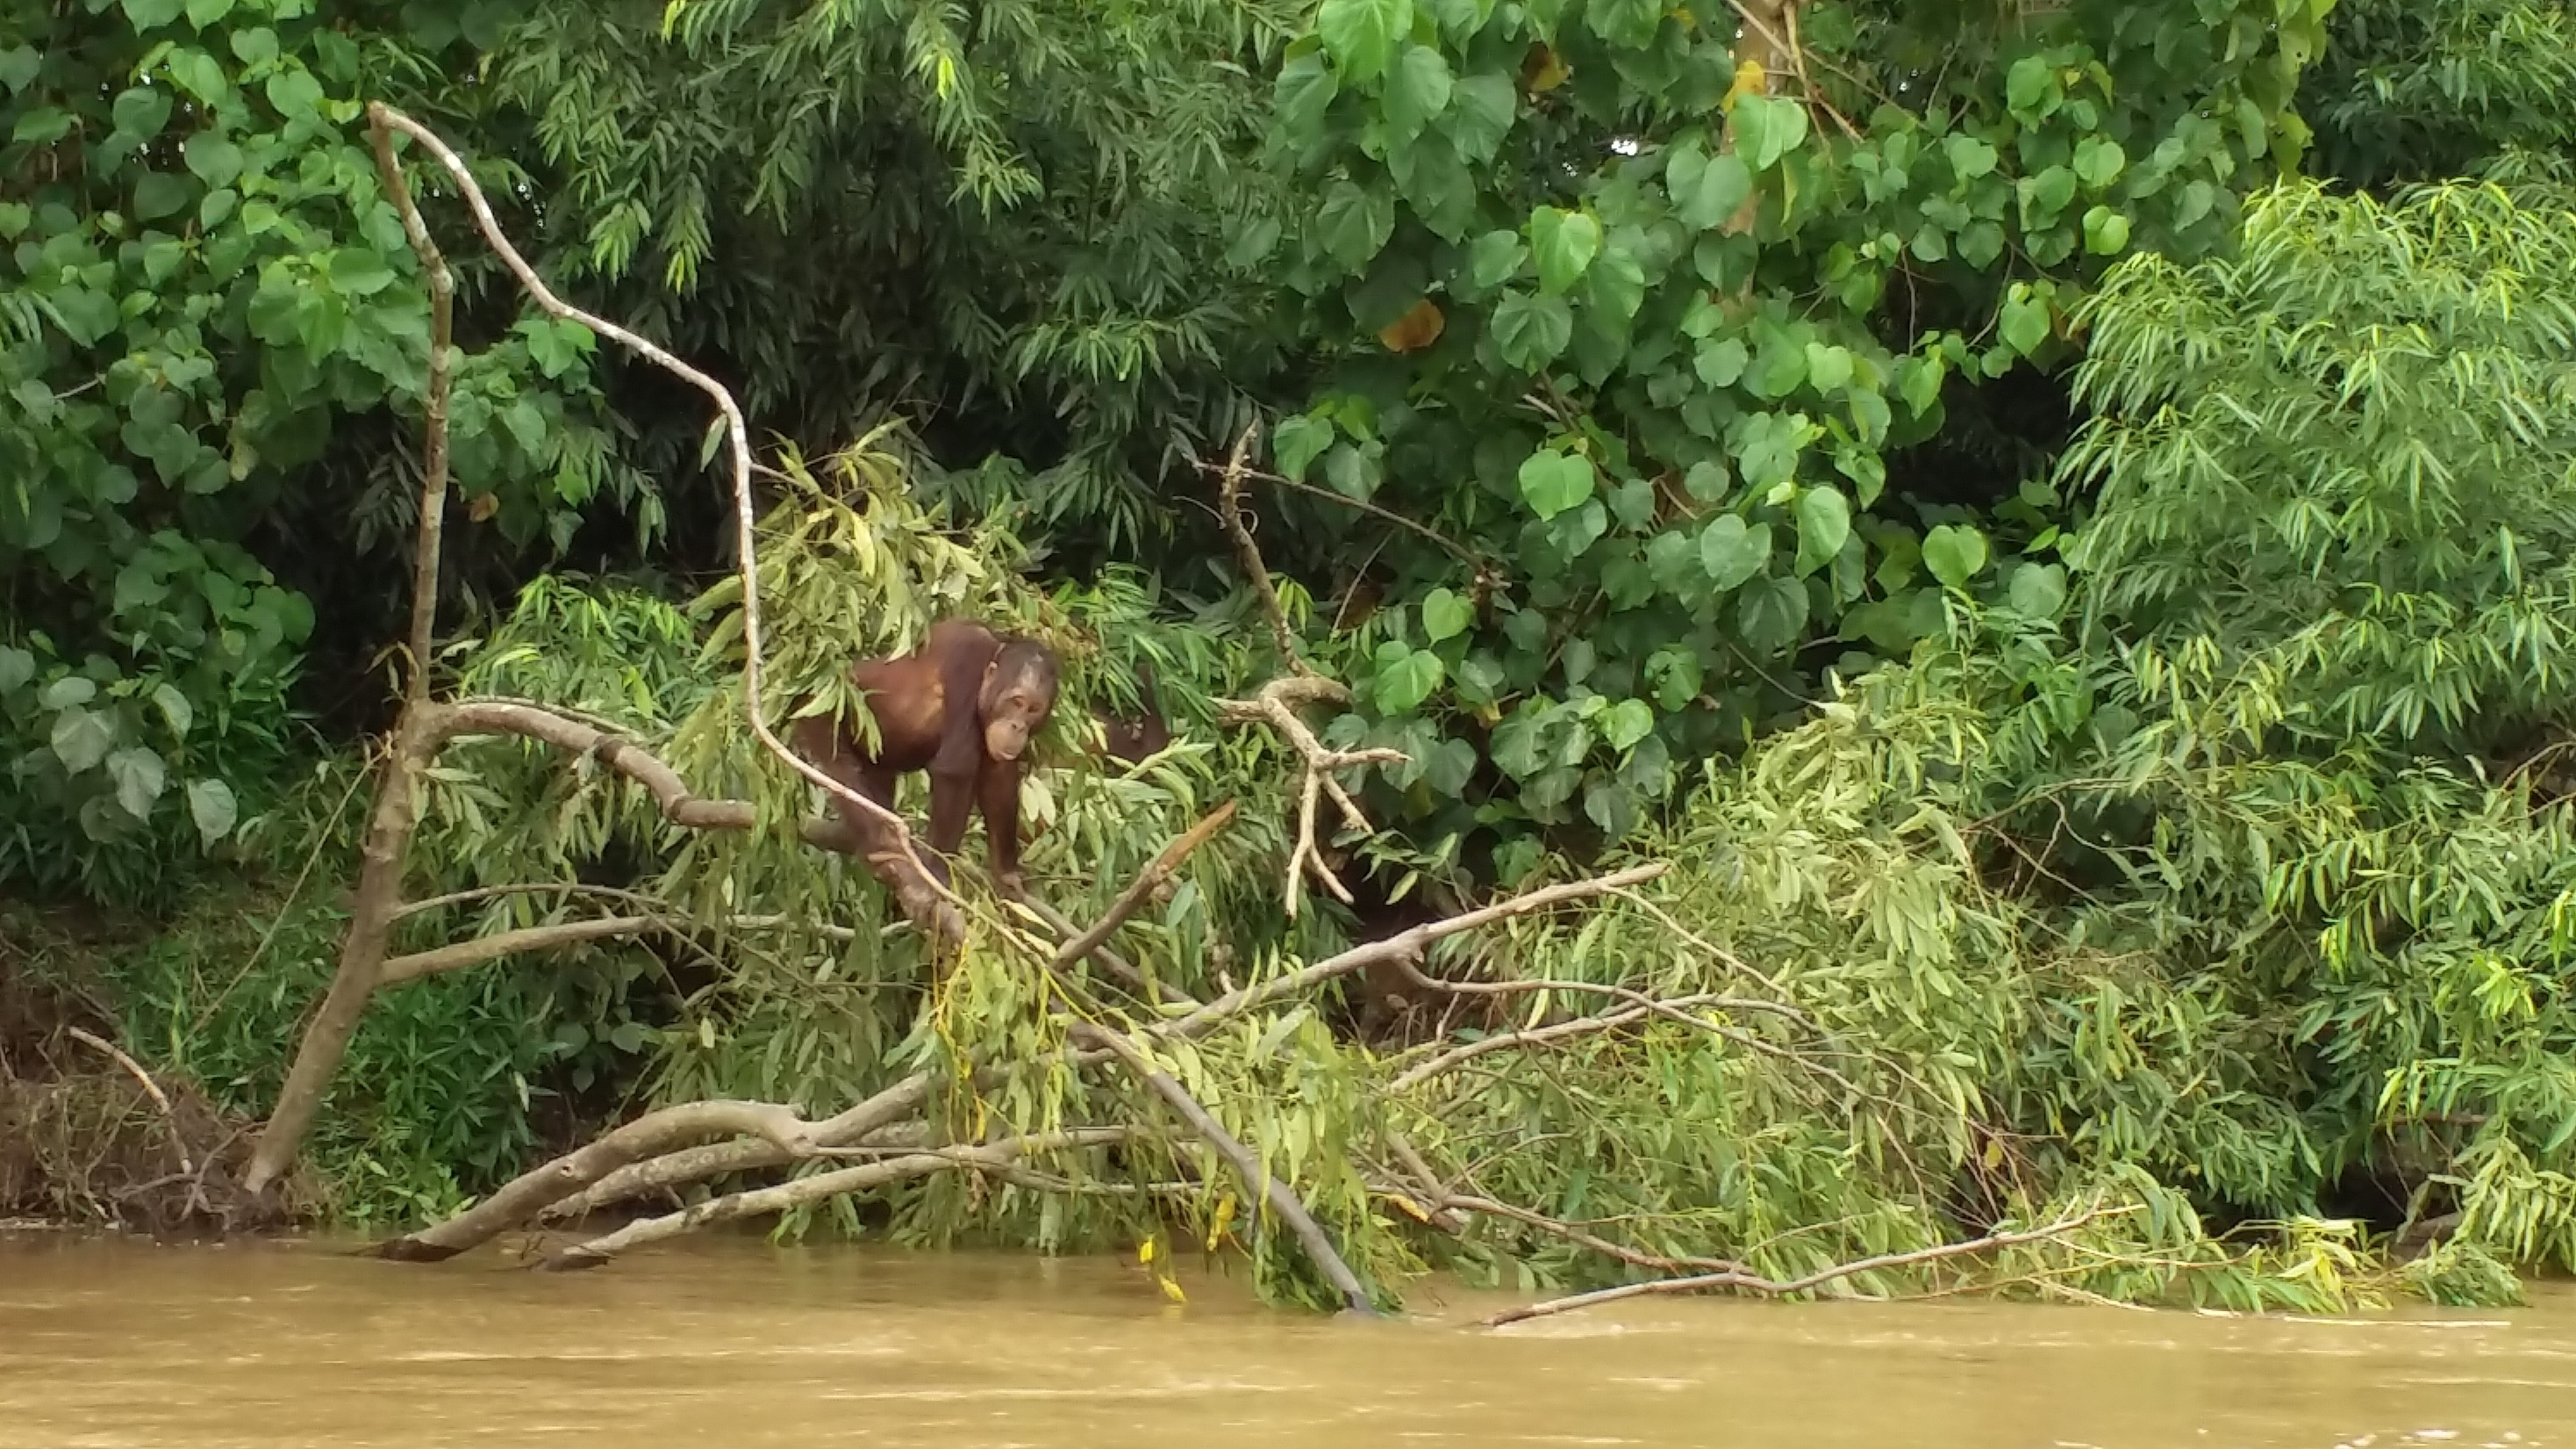 orangutans, cloud leopard, proboscis monkeys, spiders, snakes, monkey, forest, jungle, whale shark, sun bear, birds, lizards